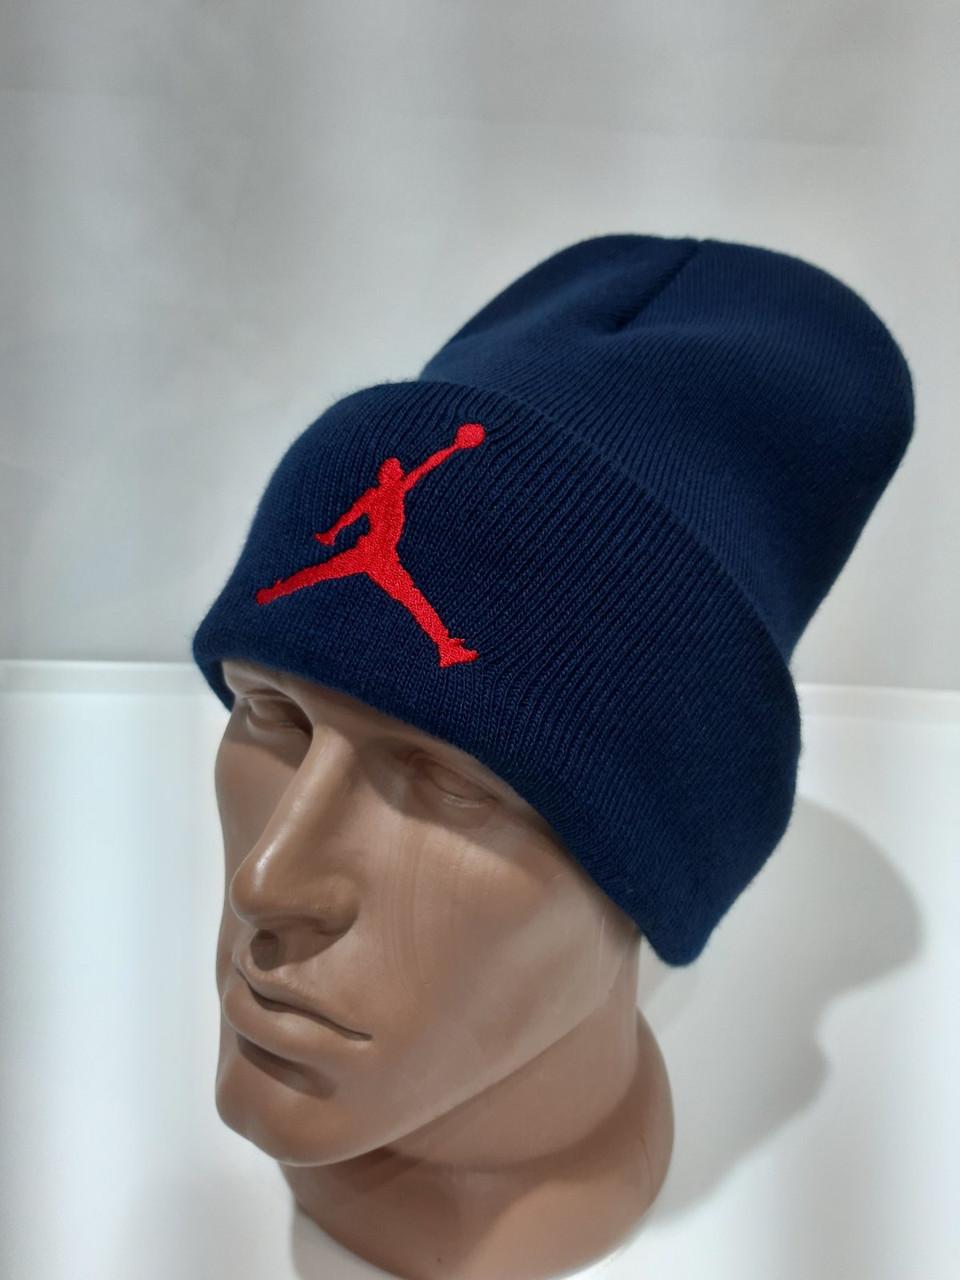 Зимняя мужская шерстяная теплая шапка Турция Темно-синяя